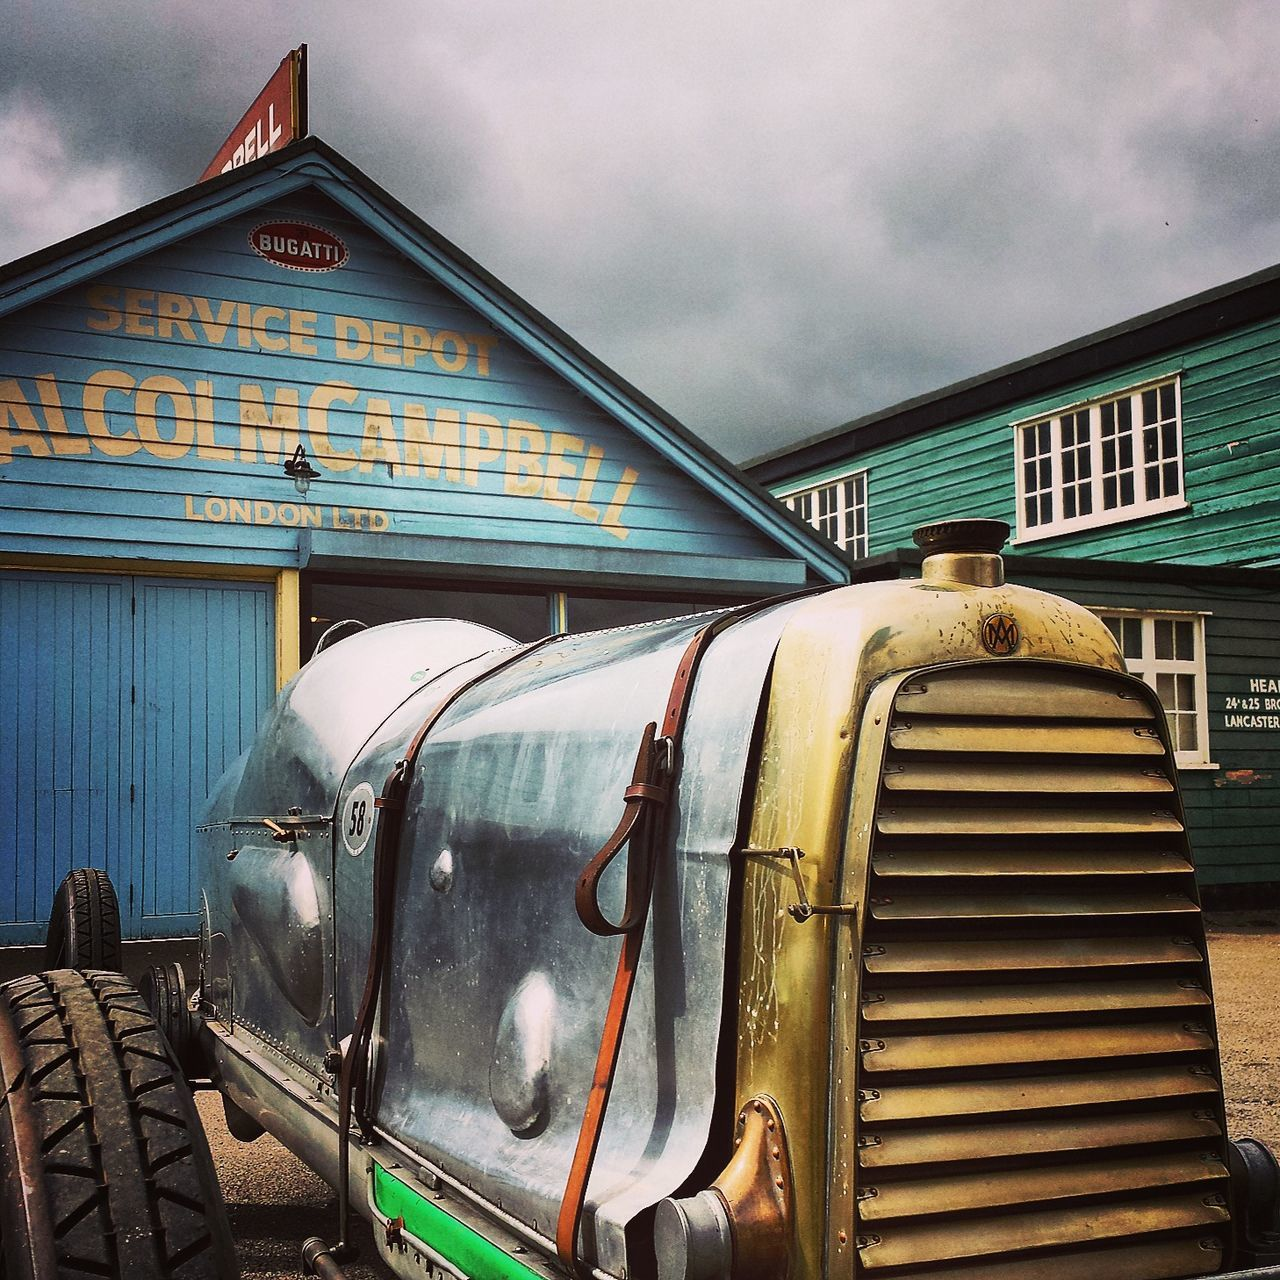 Aston Aston Martin Astonmartin Brooklands Brooklandsmuseum Classic And Vintage Racing Clouds Garages Sky Stormy Vintage Vintage Racecar Vintageracer